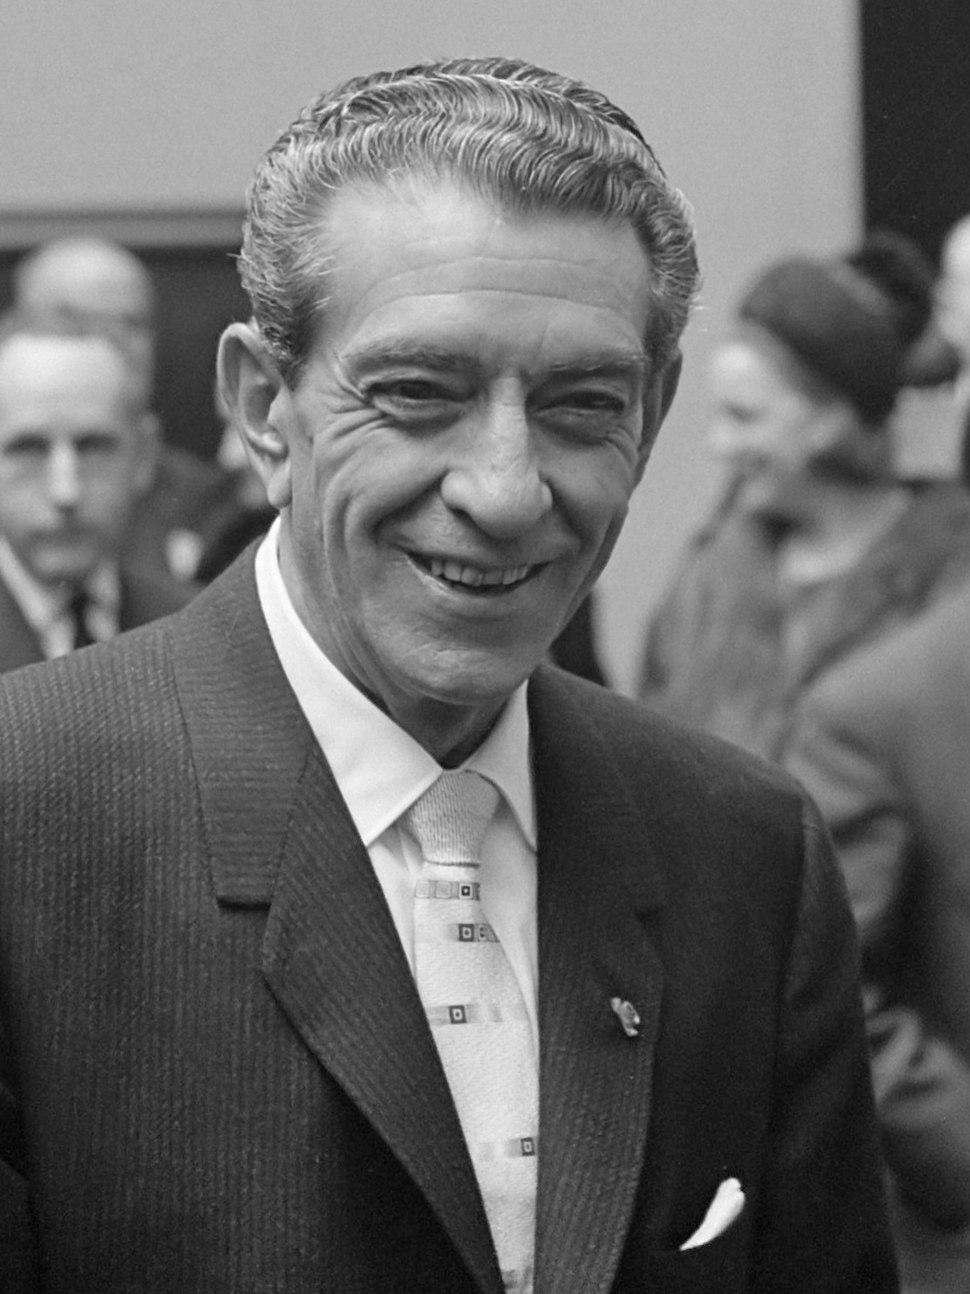 Adolfo L%C3%B3pez Mateos (1963)